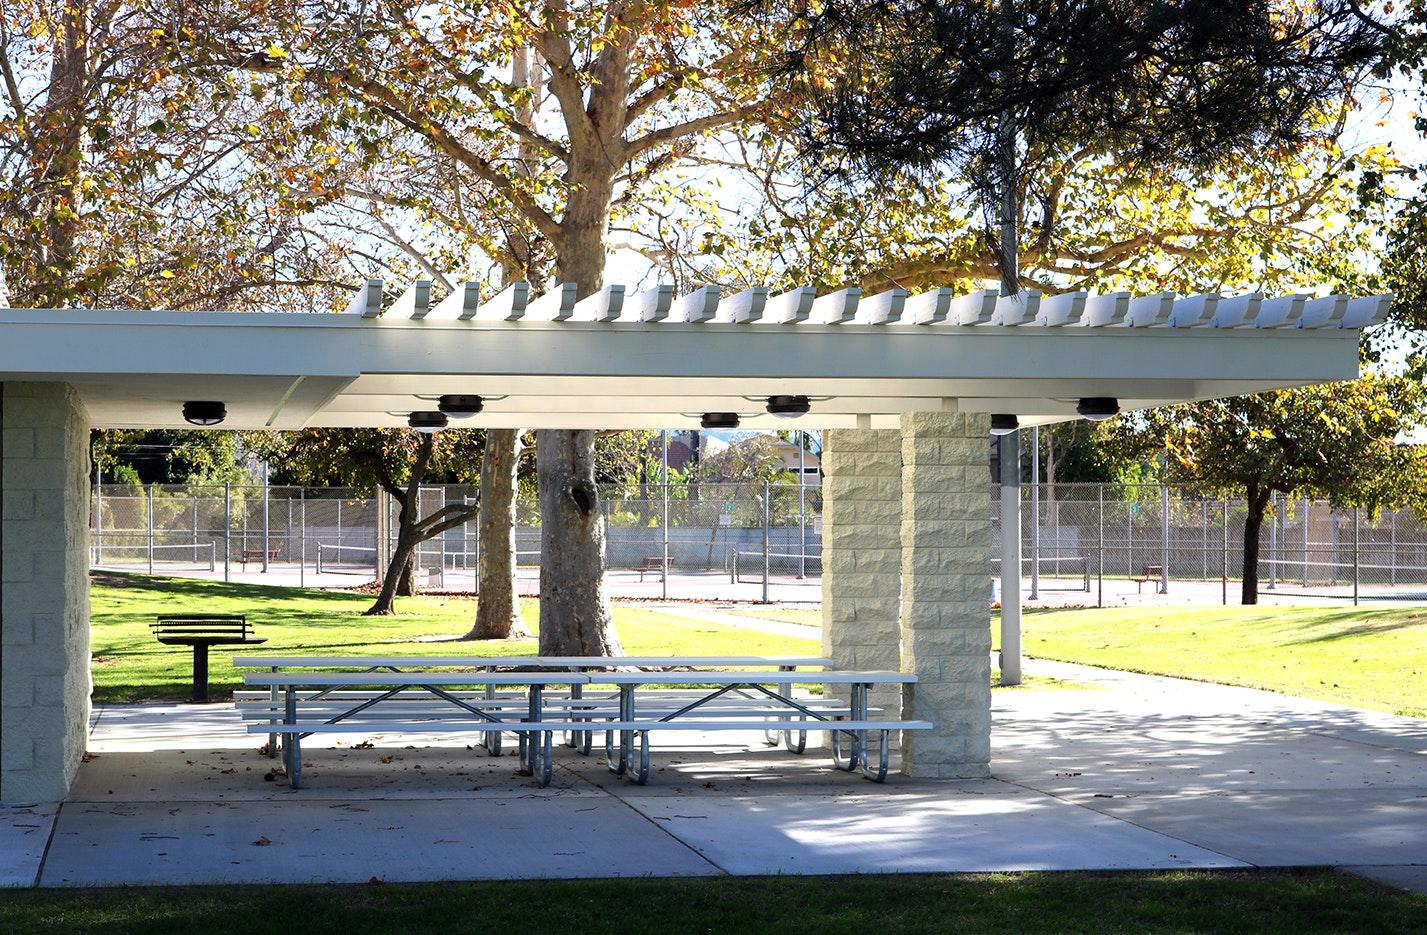 Valle Lindo Park picnic shelter